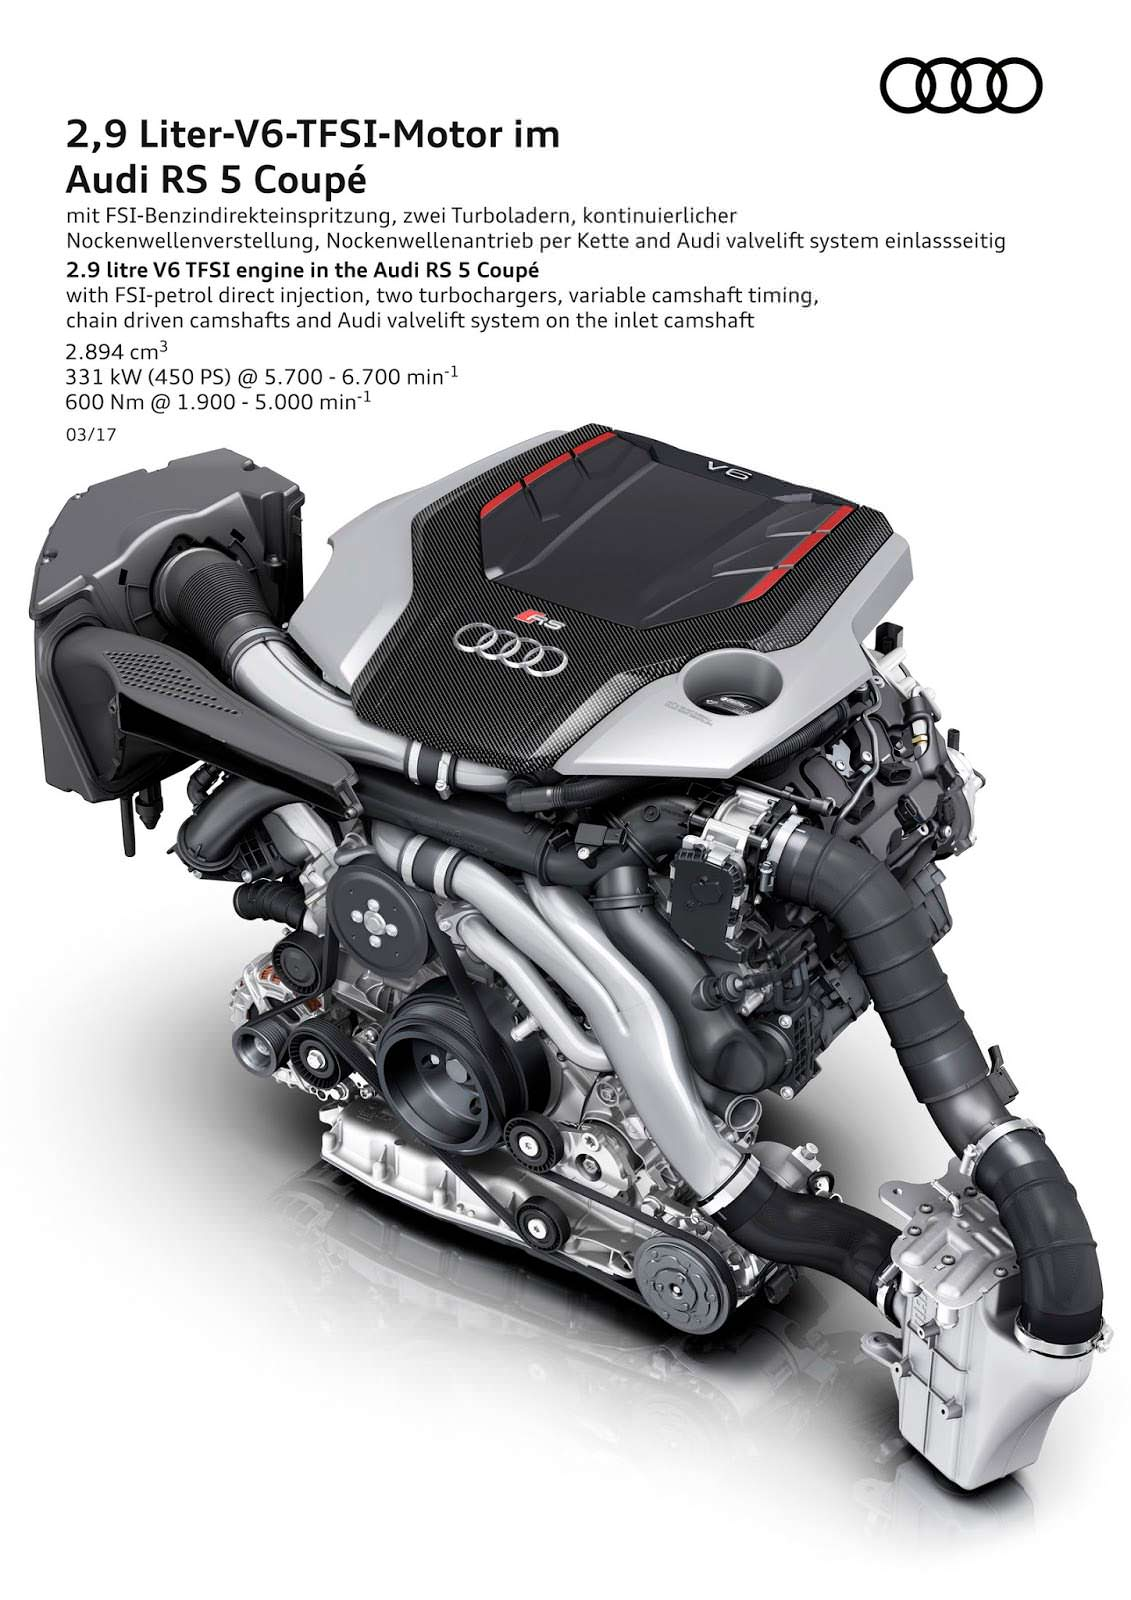 Двигатель 2.9 TFSI V6